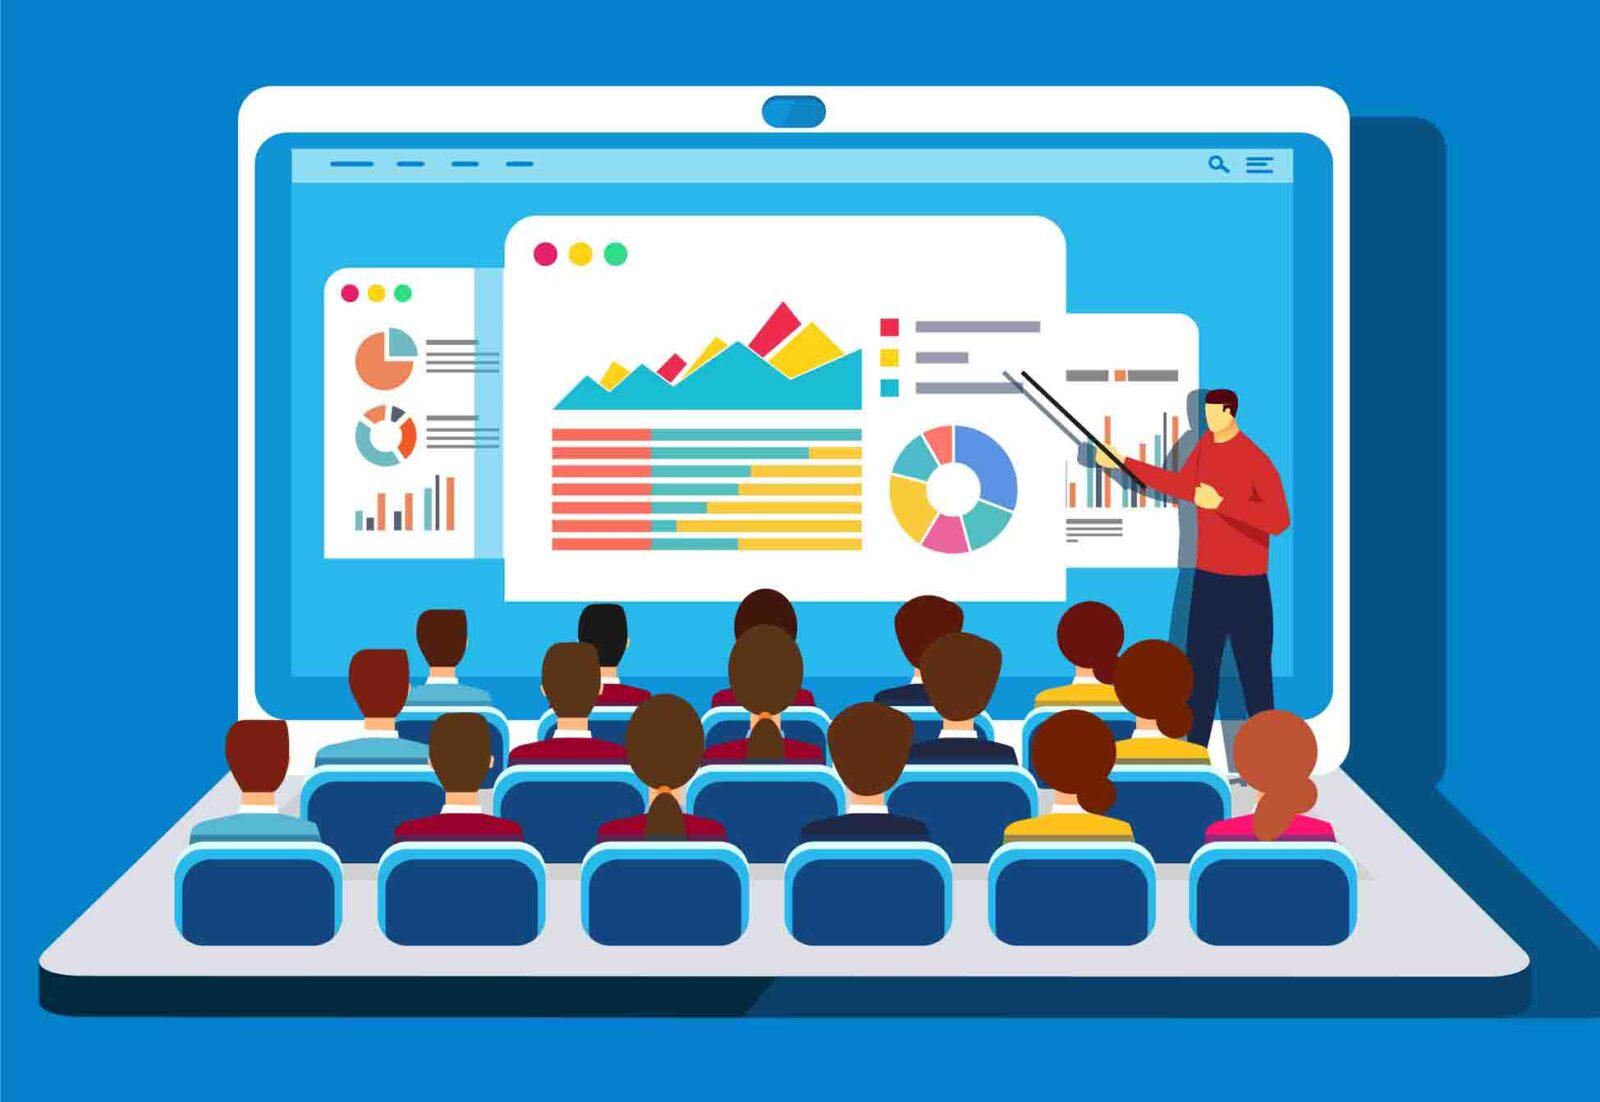 How Plan Digital Marketing strategies During COVID-19?